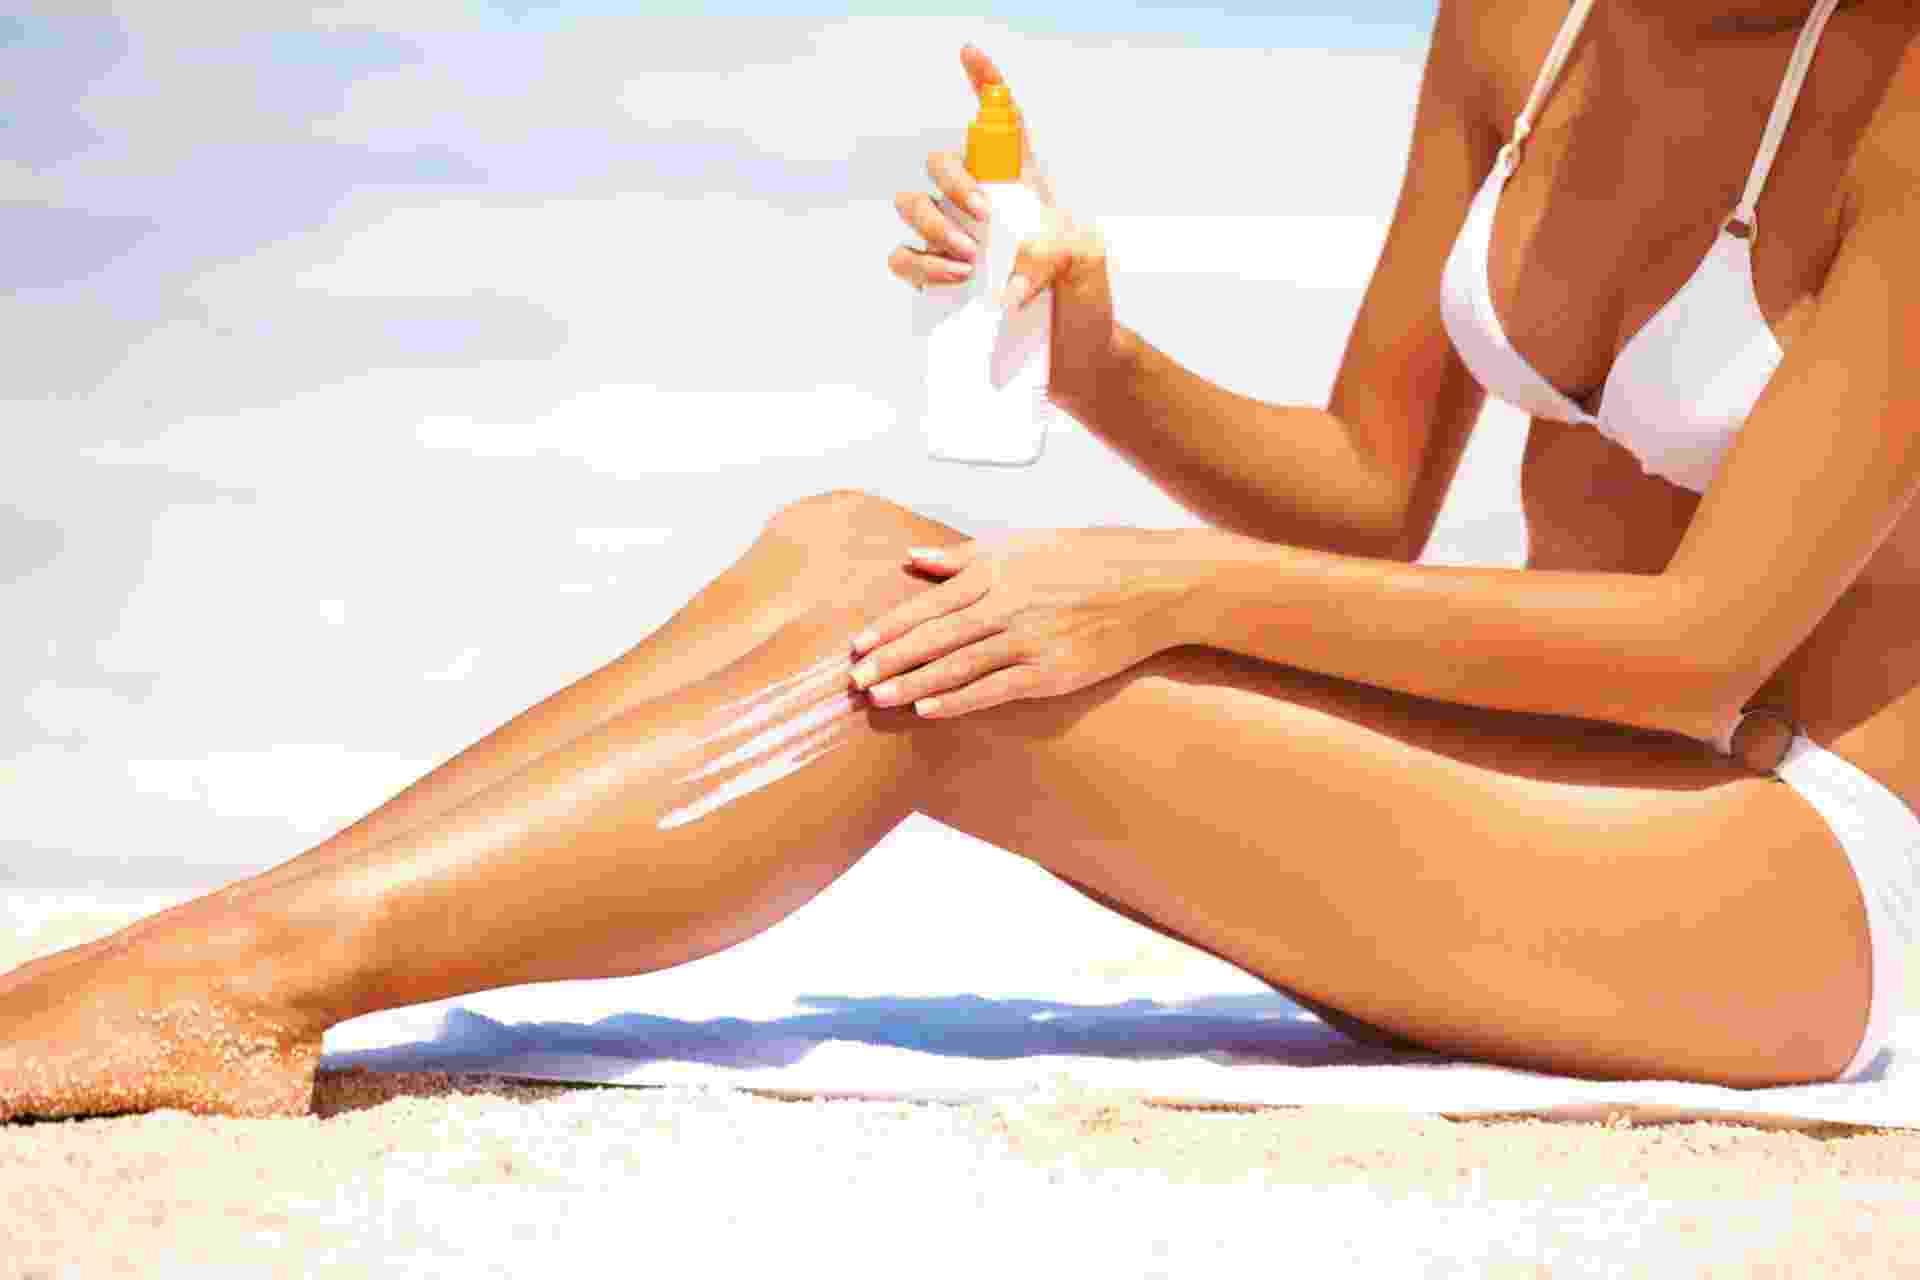 Mulher aplicando protetor solar na praia - Thinkstock